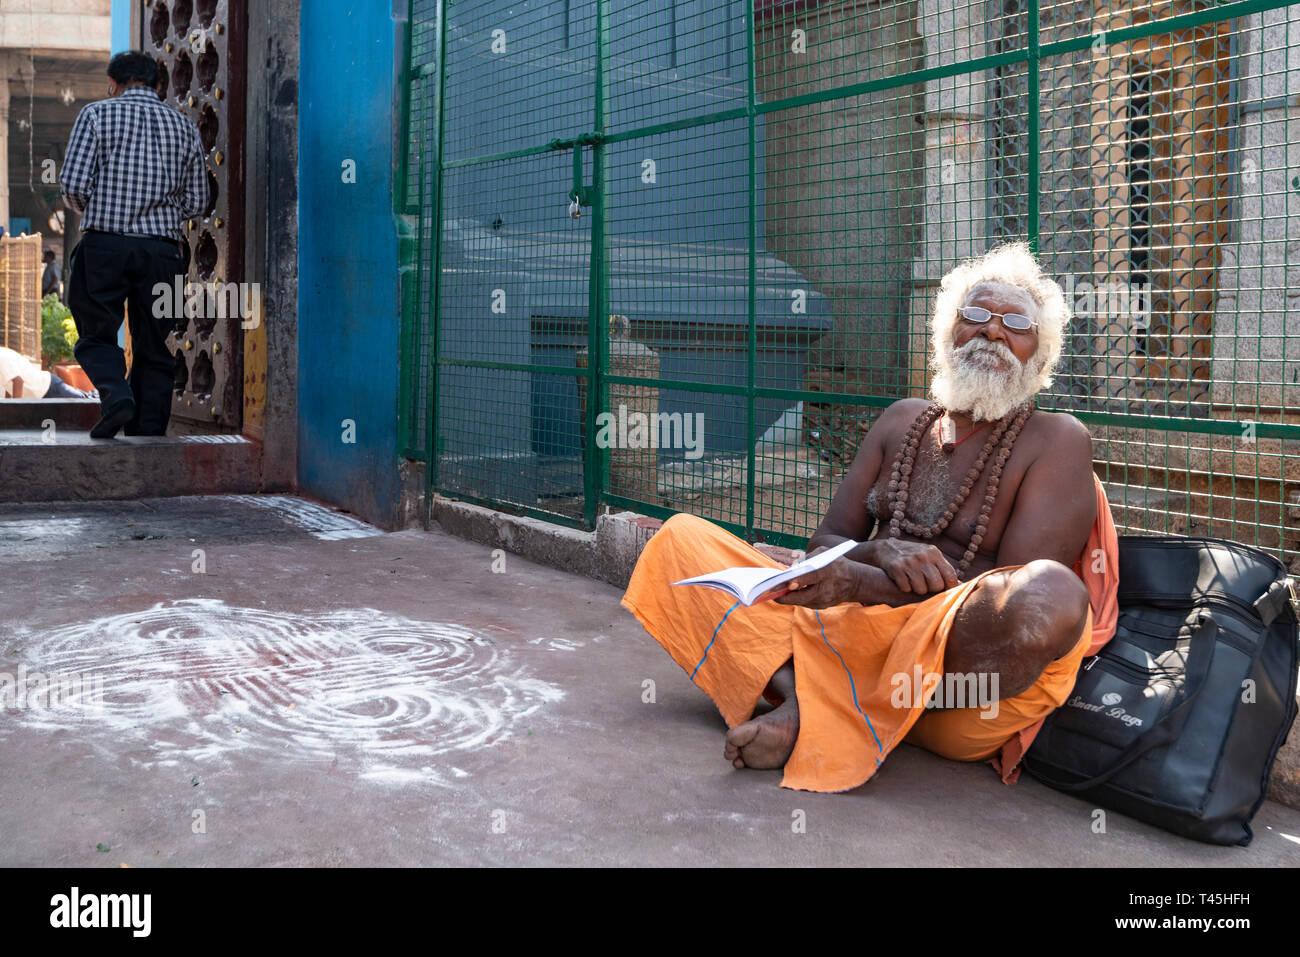 Horizontal portrait of an old Sadhu sitting at the gates of the Kapaleeshwarar Temple in Chennai, India. - Stock Image